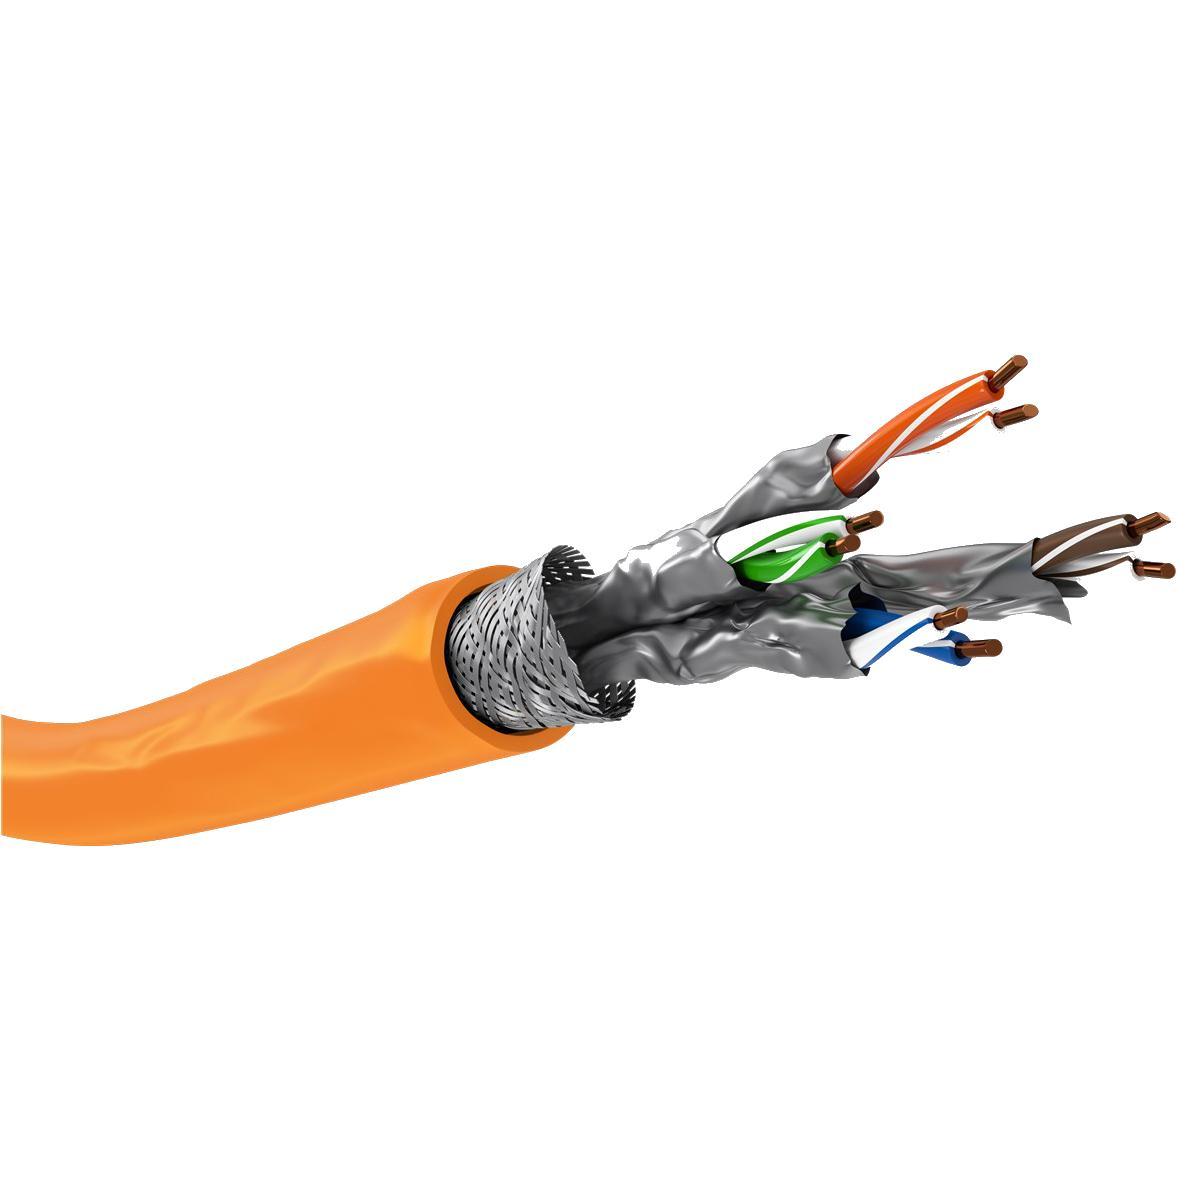 Image of Netwerkkabel op rol - 100 meter - oranje - Quality4All